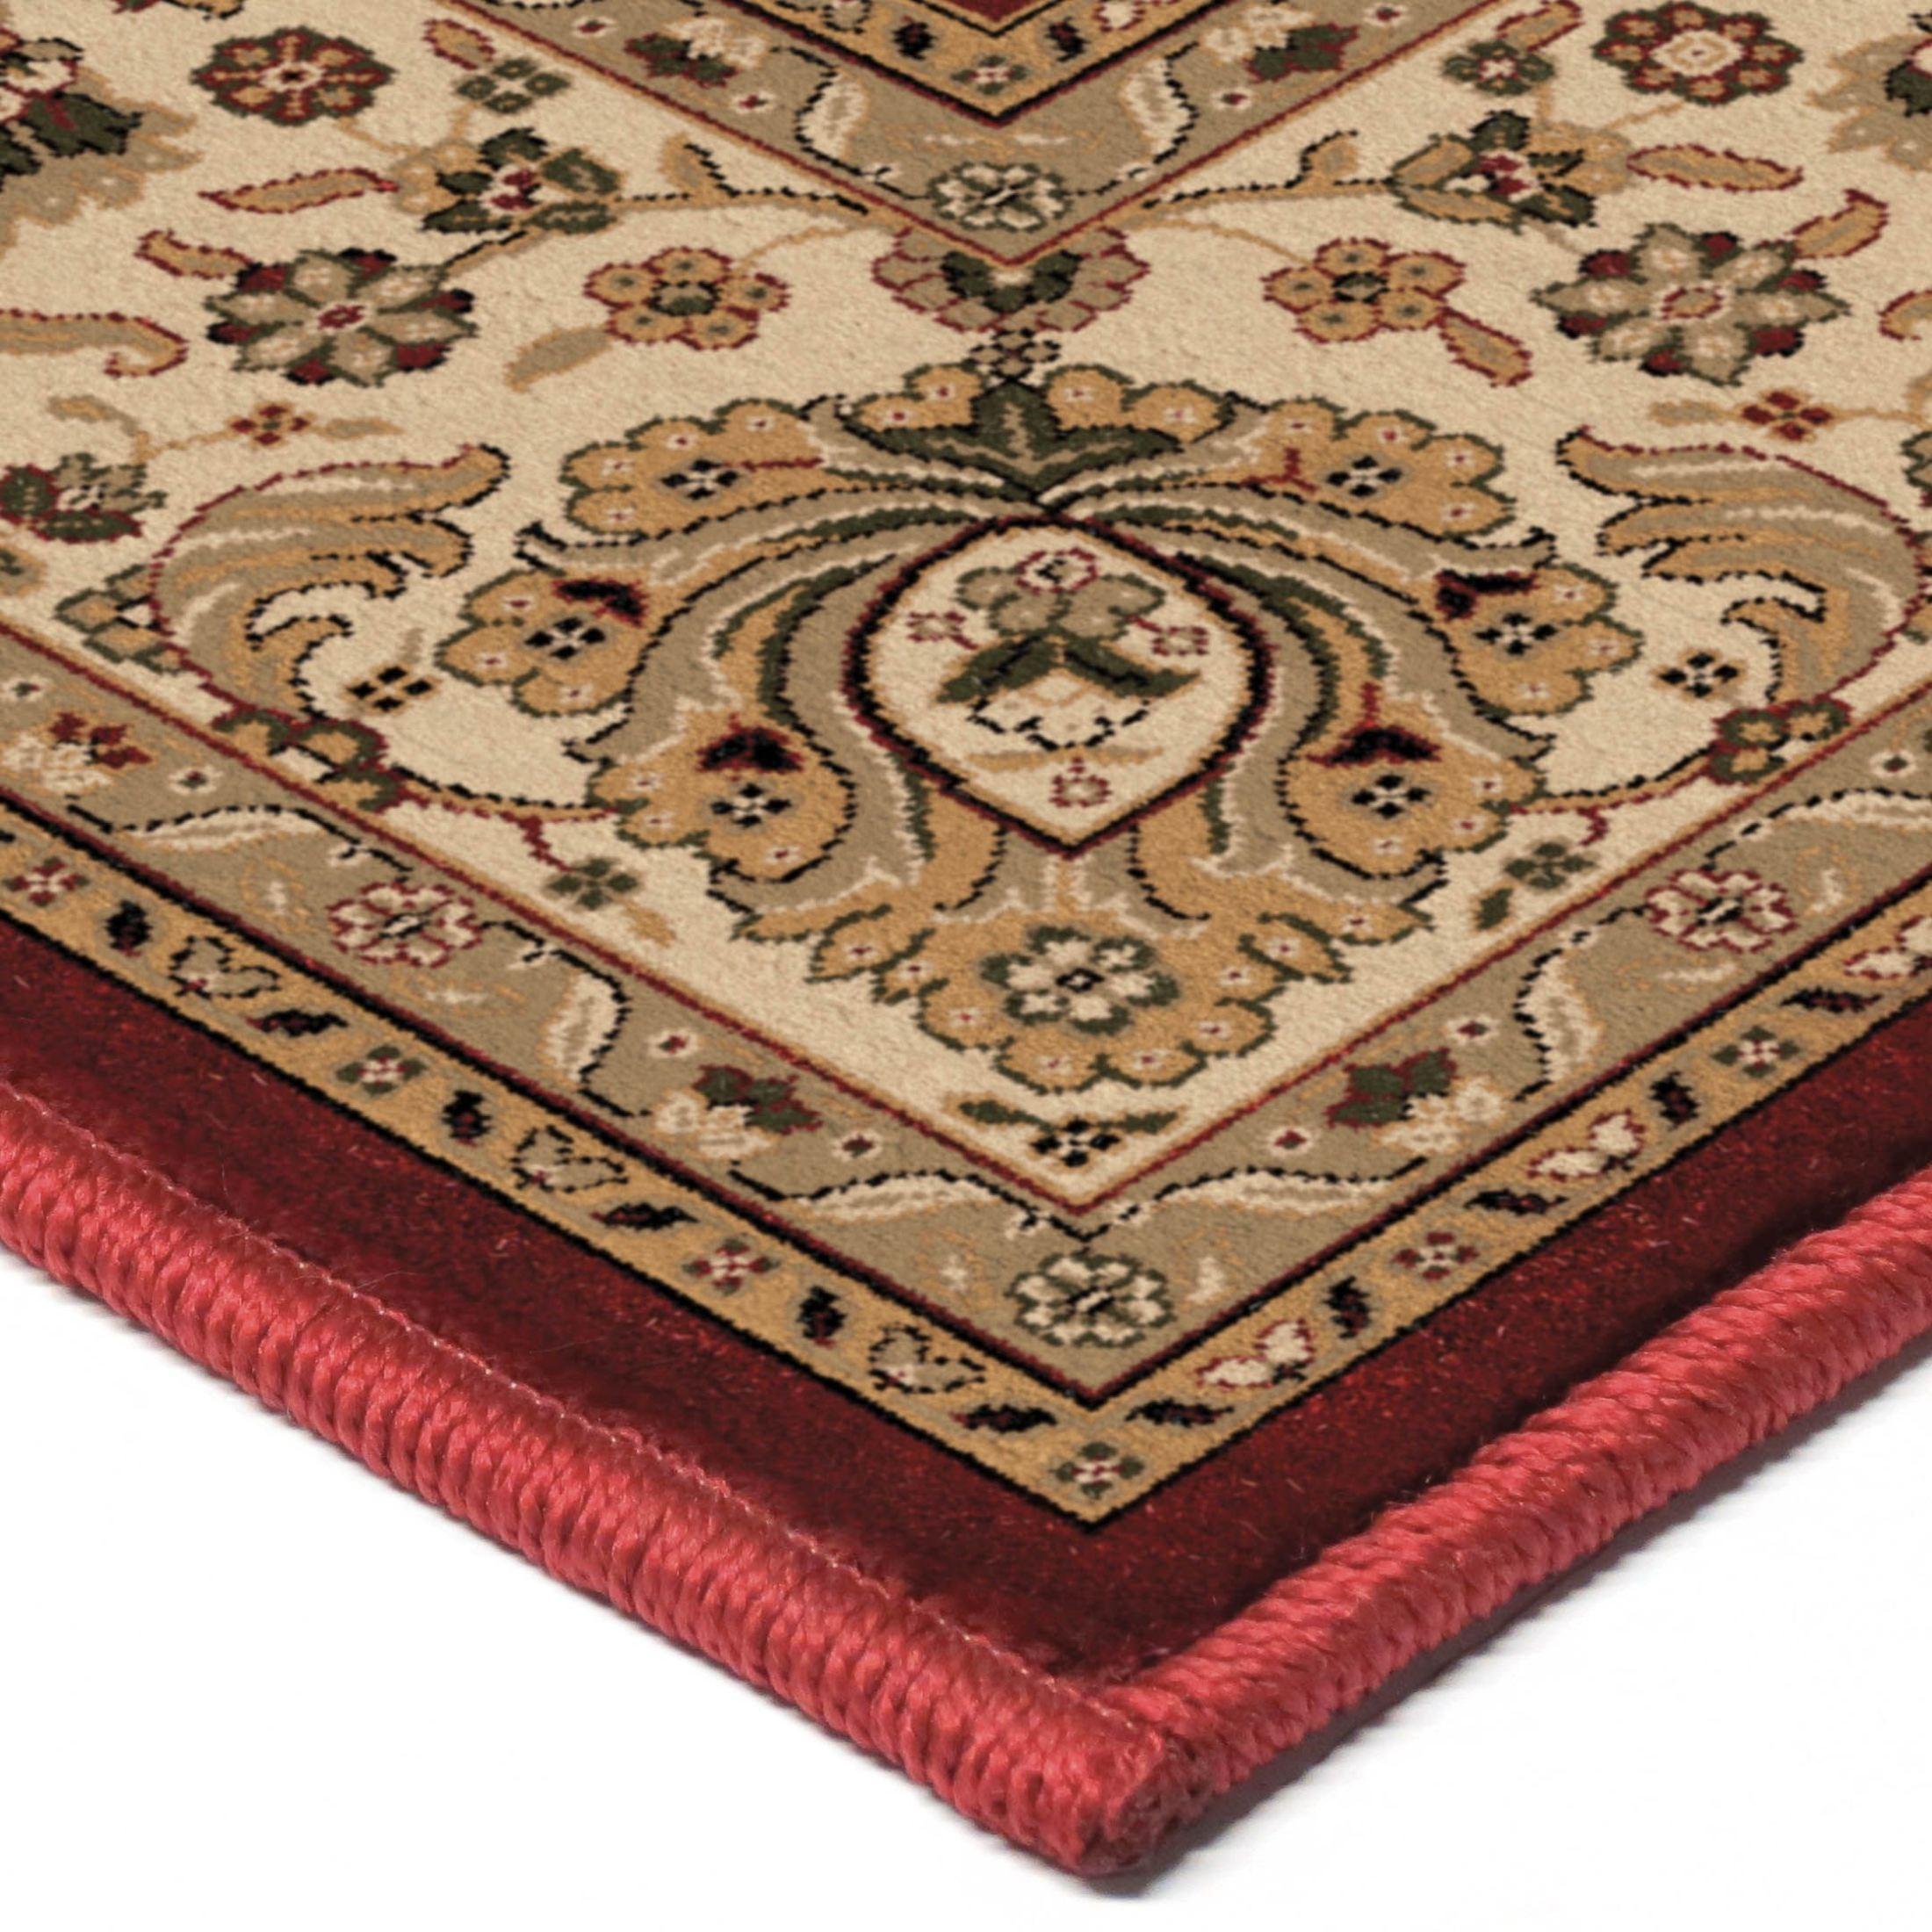 orian rugs detailed design traditional borokan burgundy. Black Bedroom Furniture Sets. Home Design Ideas